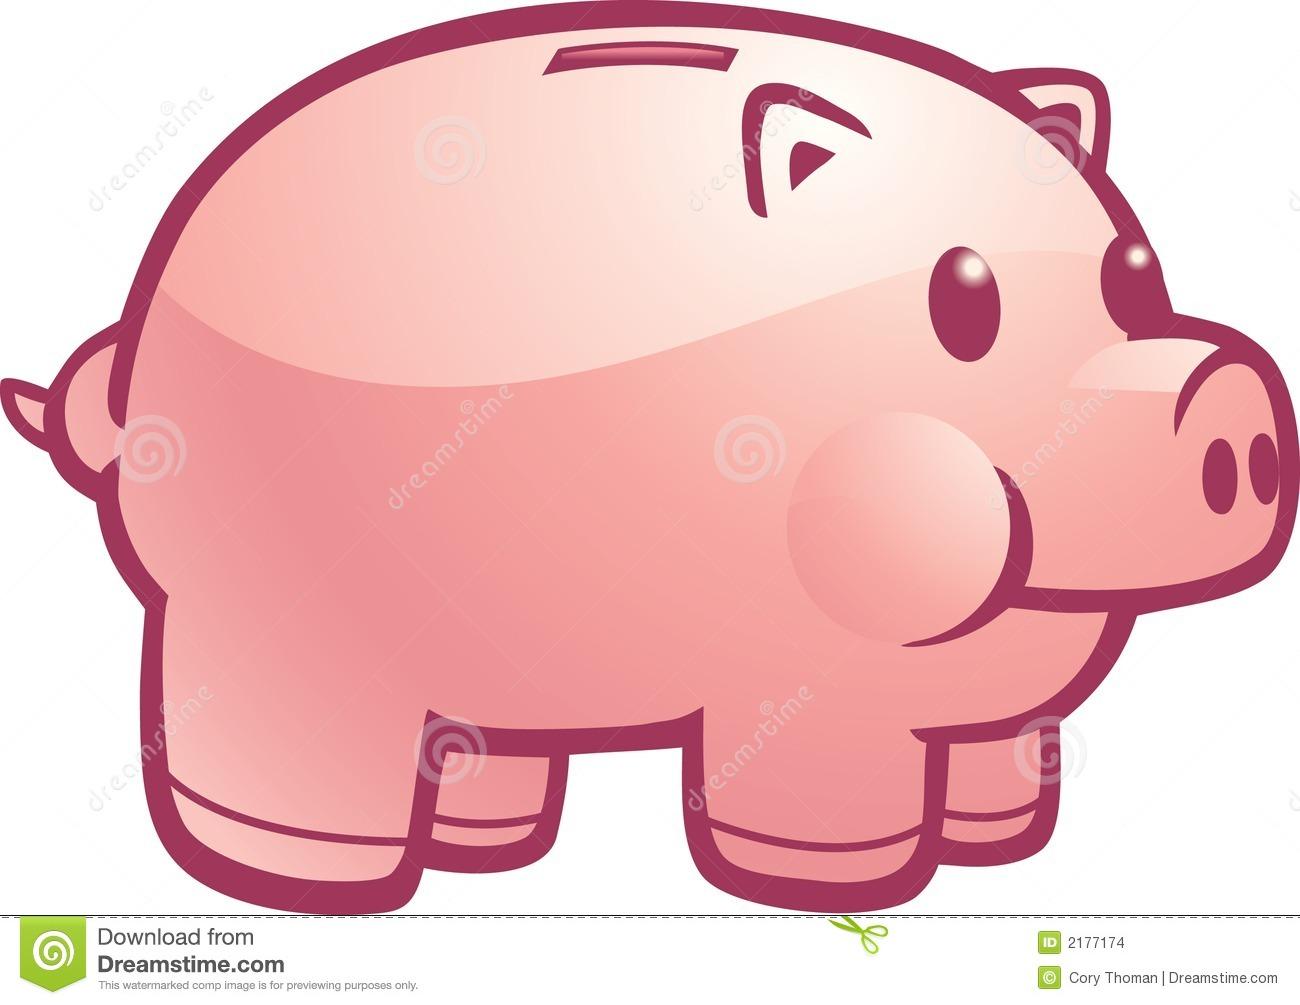 Broken piggy bank clipart father free. Cute clipartfox